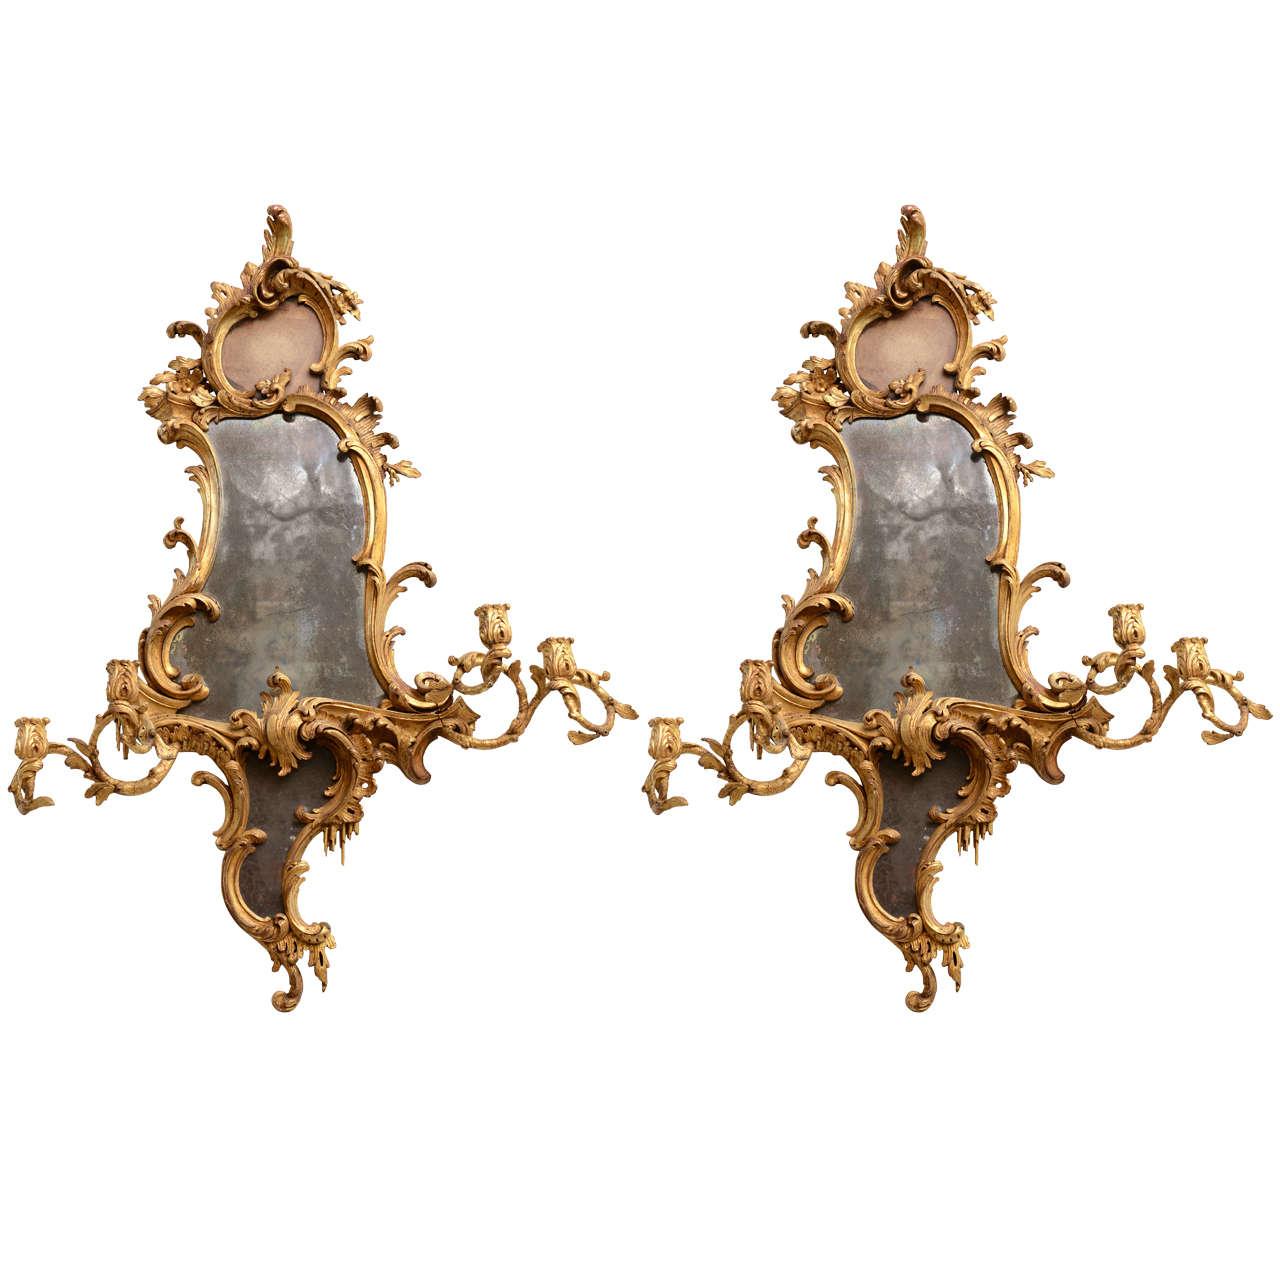 Fine Pair of George III Giltwood Girandole Mirrors, Thomas Chippendale